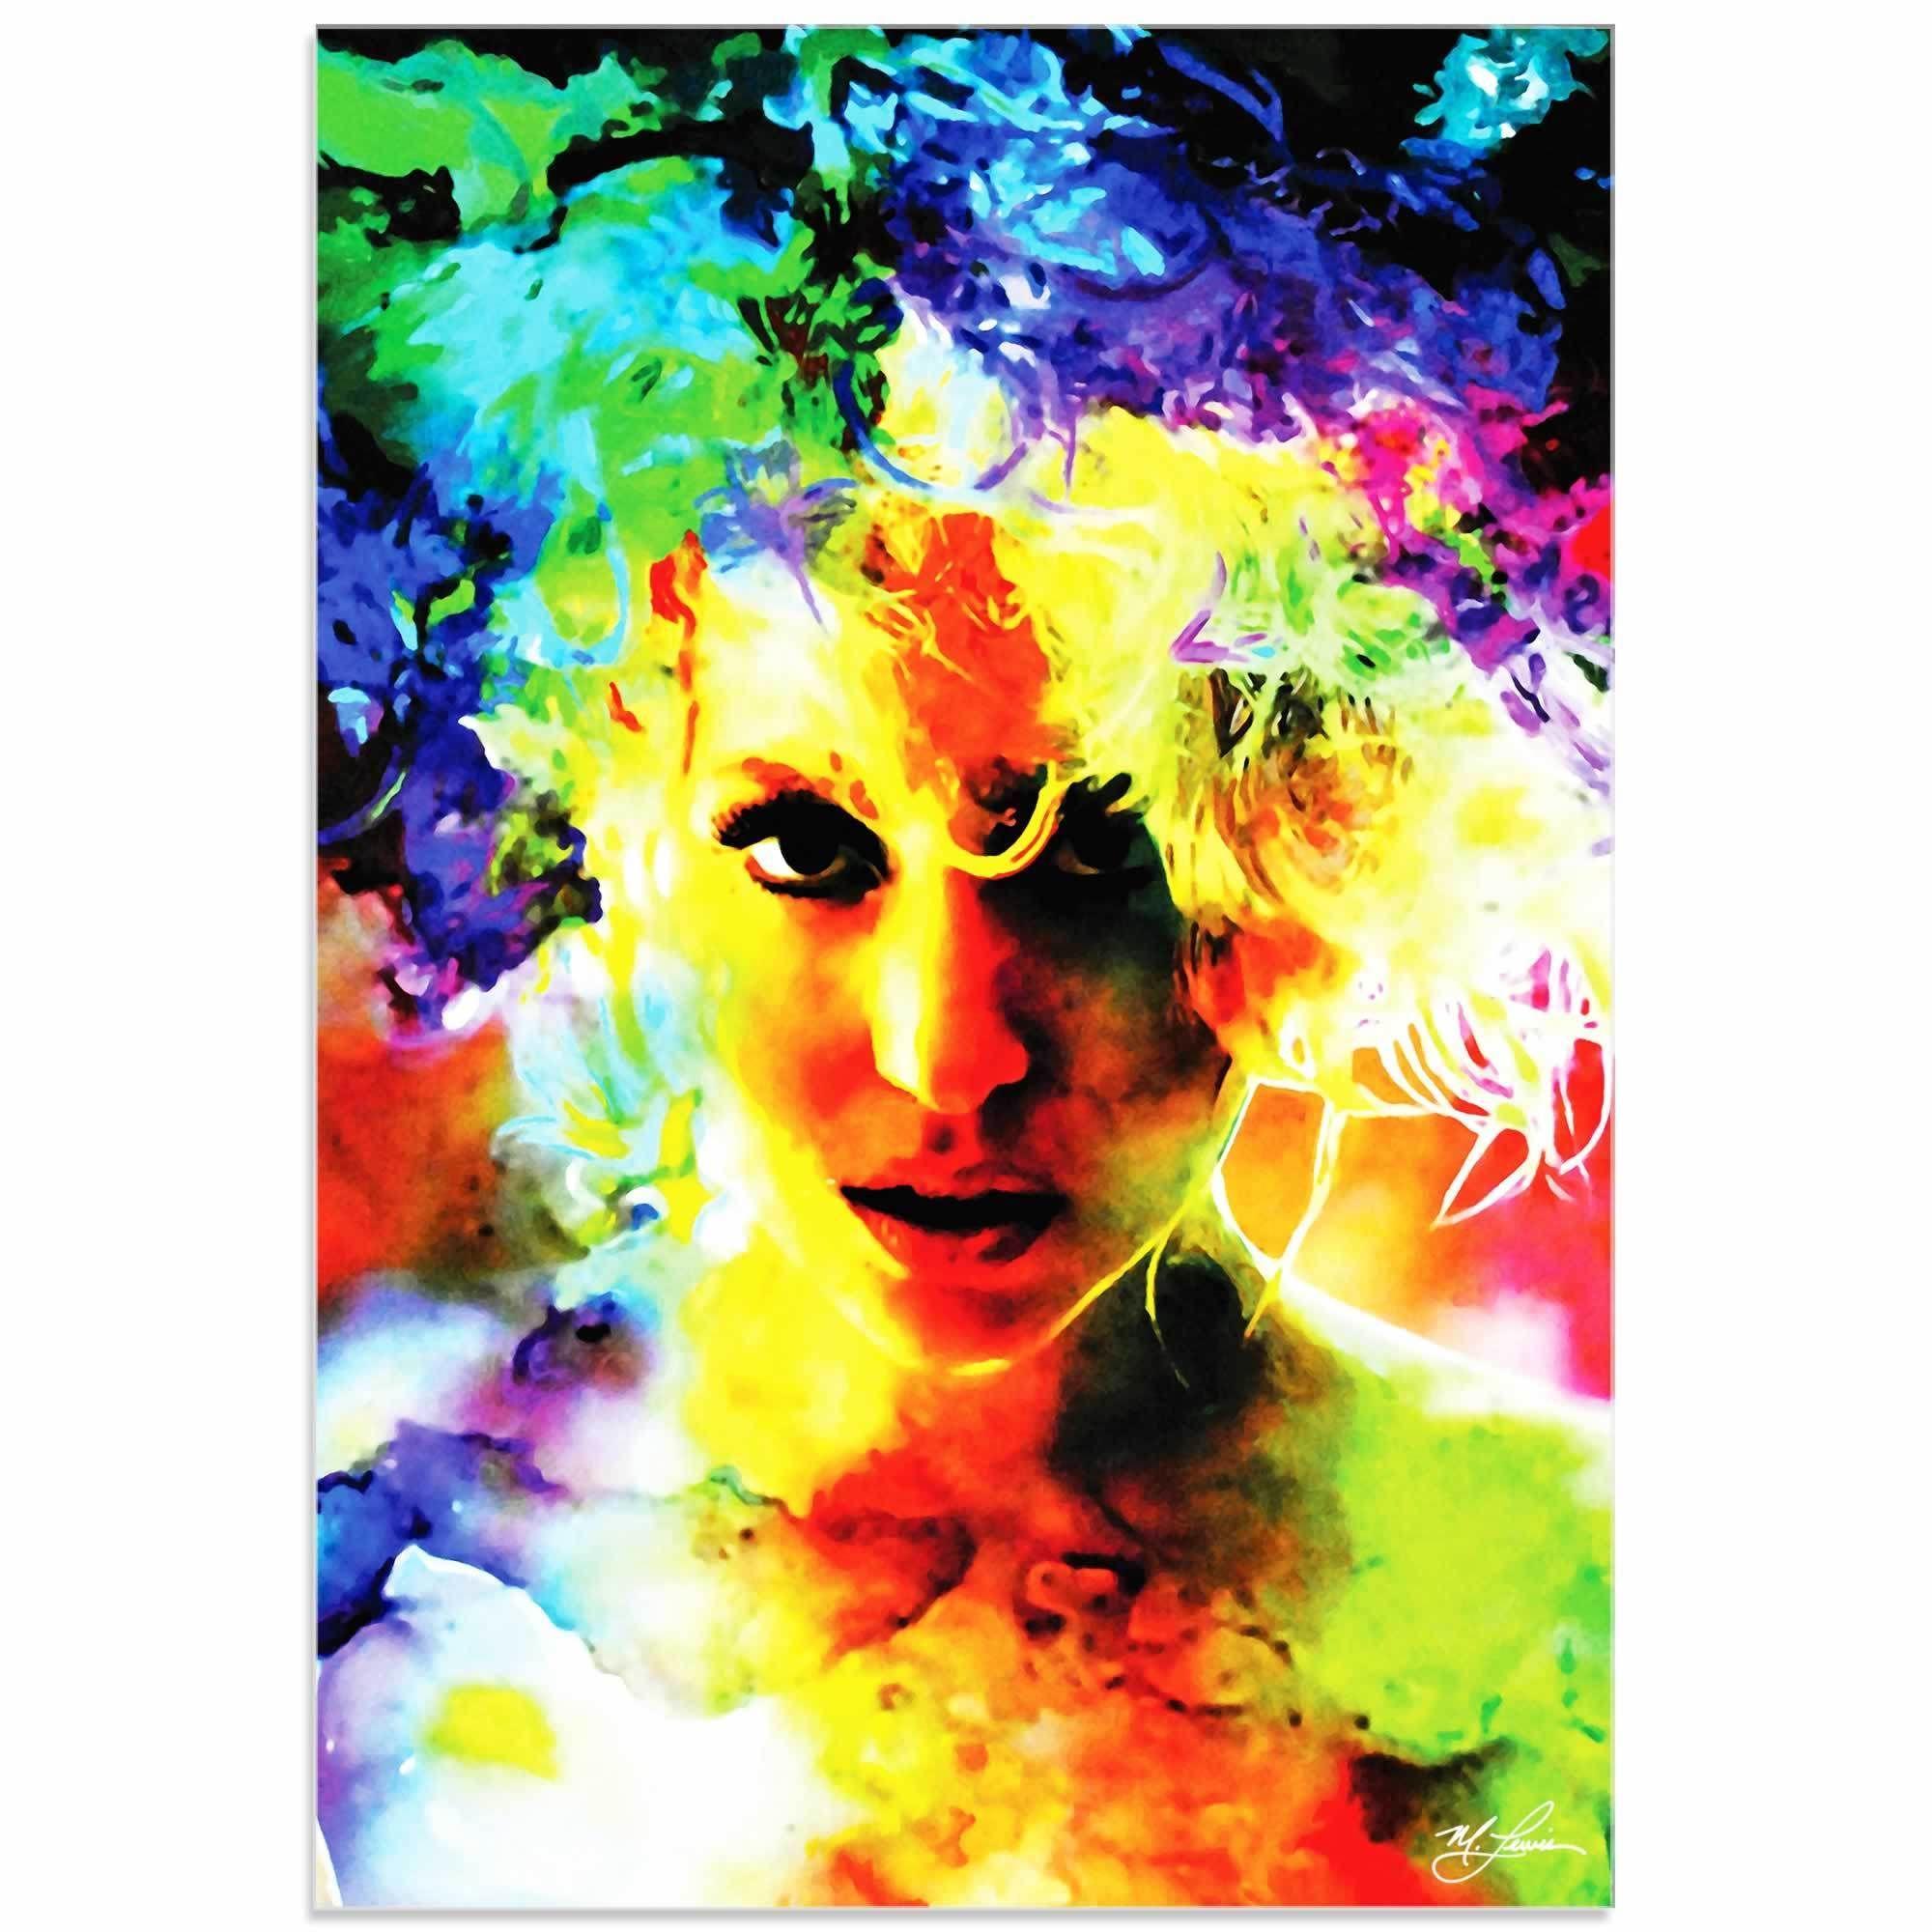 Mark Lewis 'Lady Gaga Study' Limited Edition Pop Art Print on